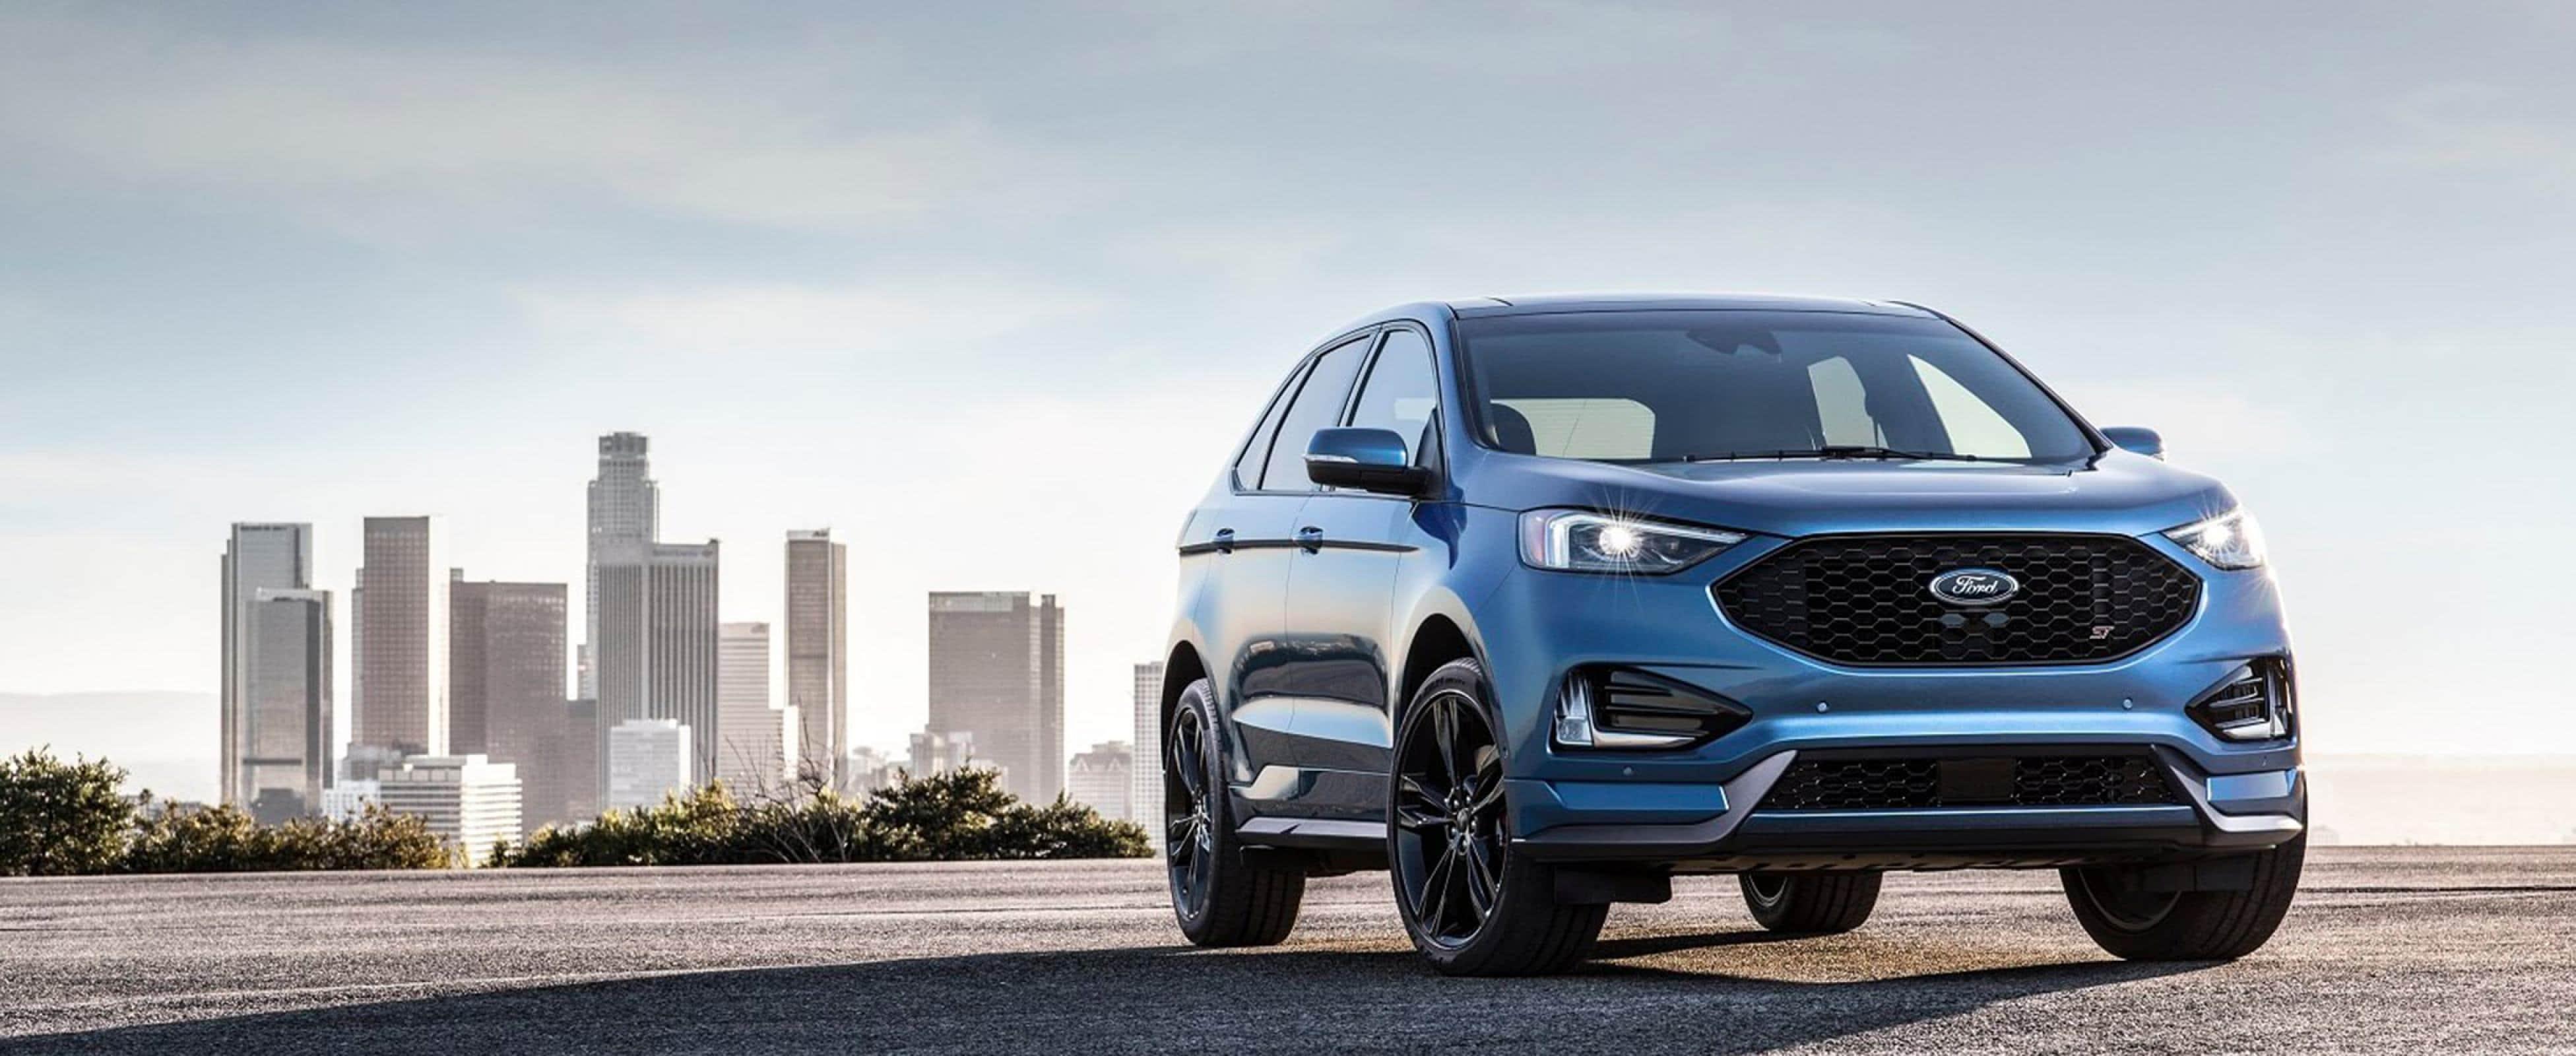 Standard Suv Rental Ford Edge Or Similar Budget Rent A Car